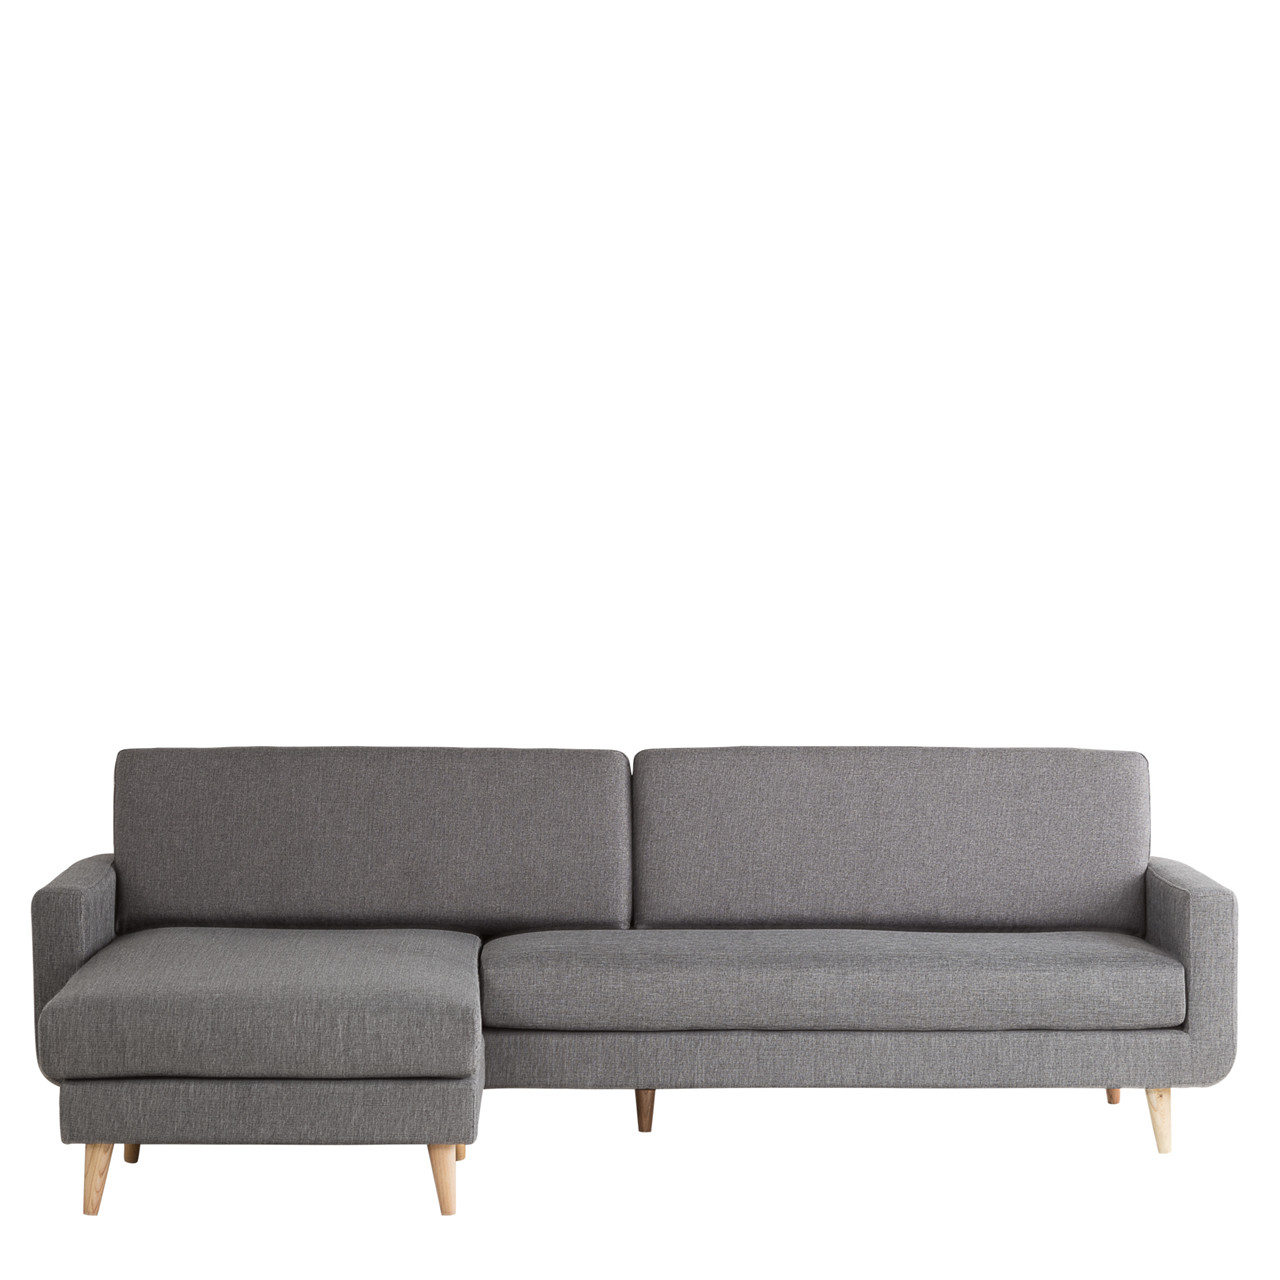 Florida Xl Chaiselong Sofa Kob Her